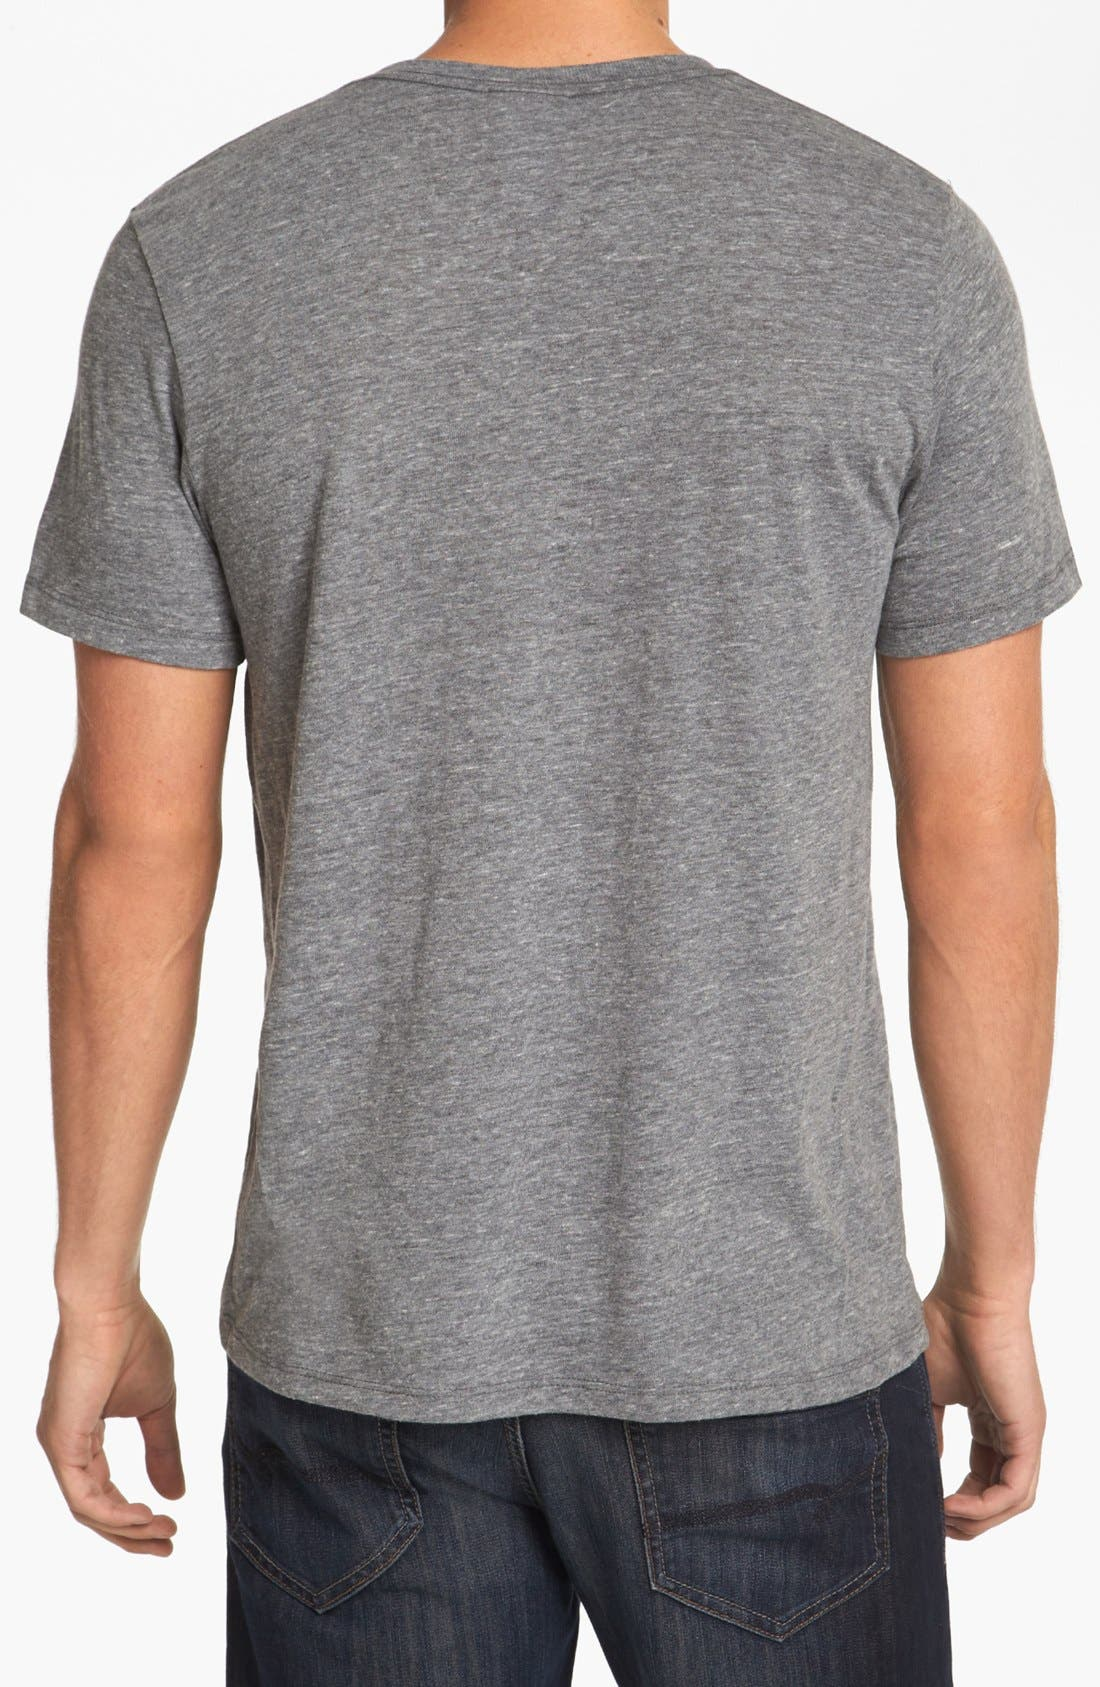 Alternate Image 2  - Junk Food 'Touchdown - Minnesota Vikings' T-Shirt